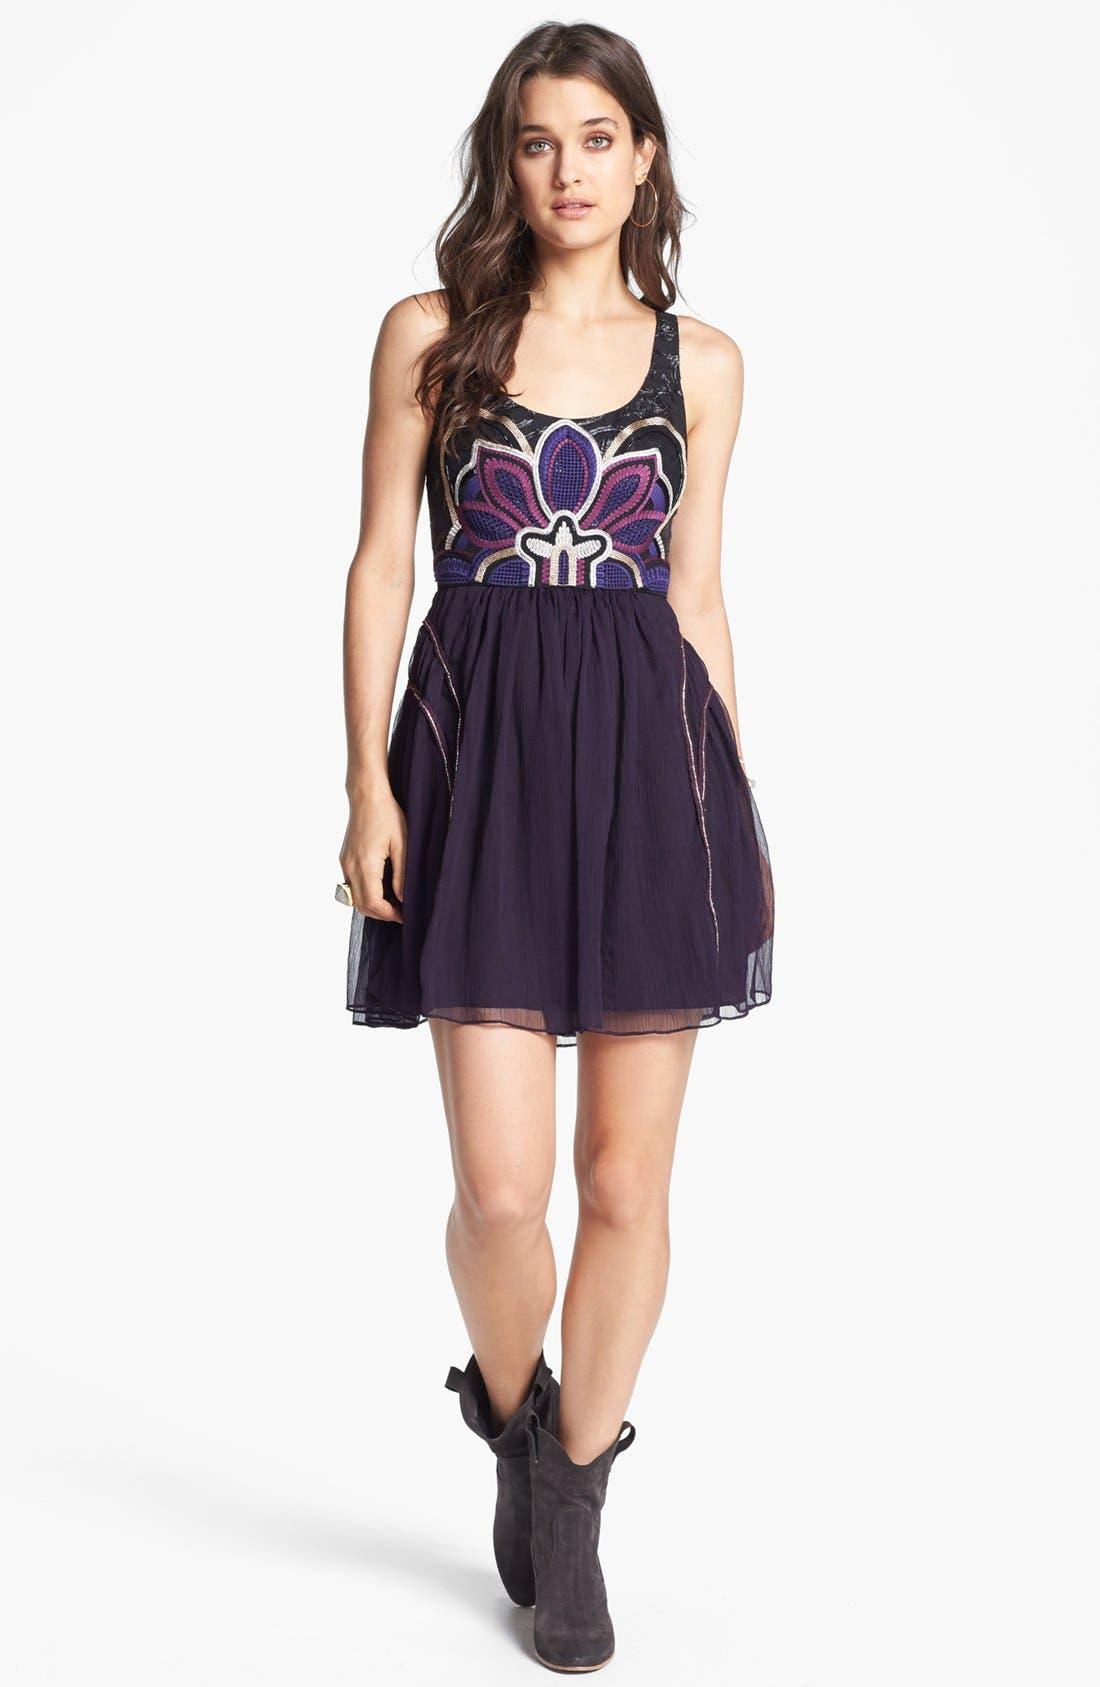 Alternate Image 1 Selected - Free People 'Lotus Pond' Embellished Fit & Flare Dress